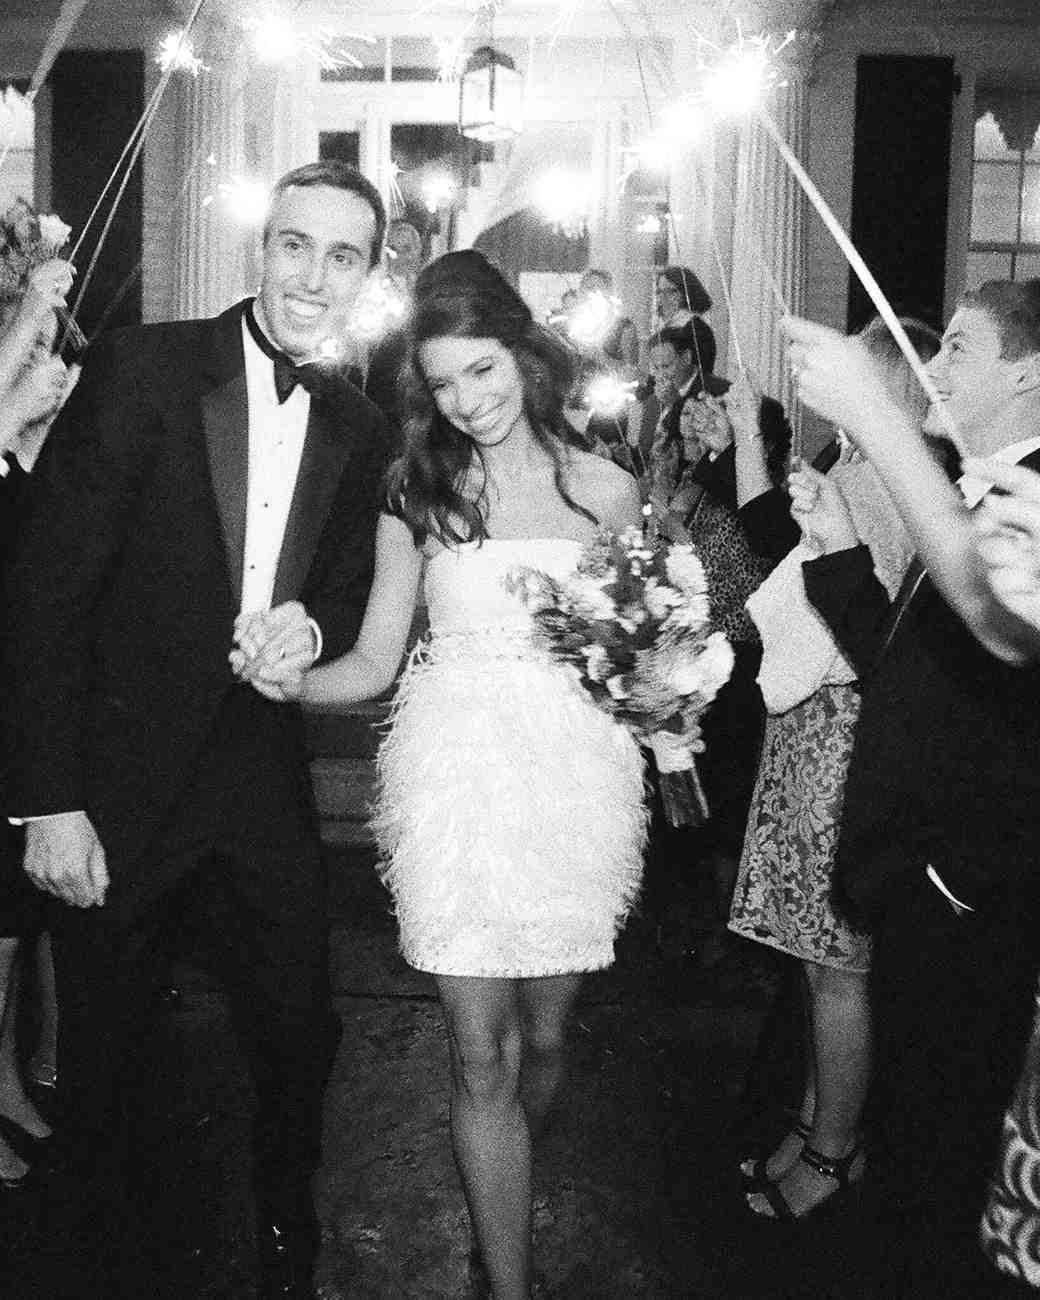 lindsay-garrett-wedding-sendoff-1088-s111850-0415.jpg